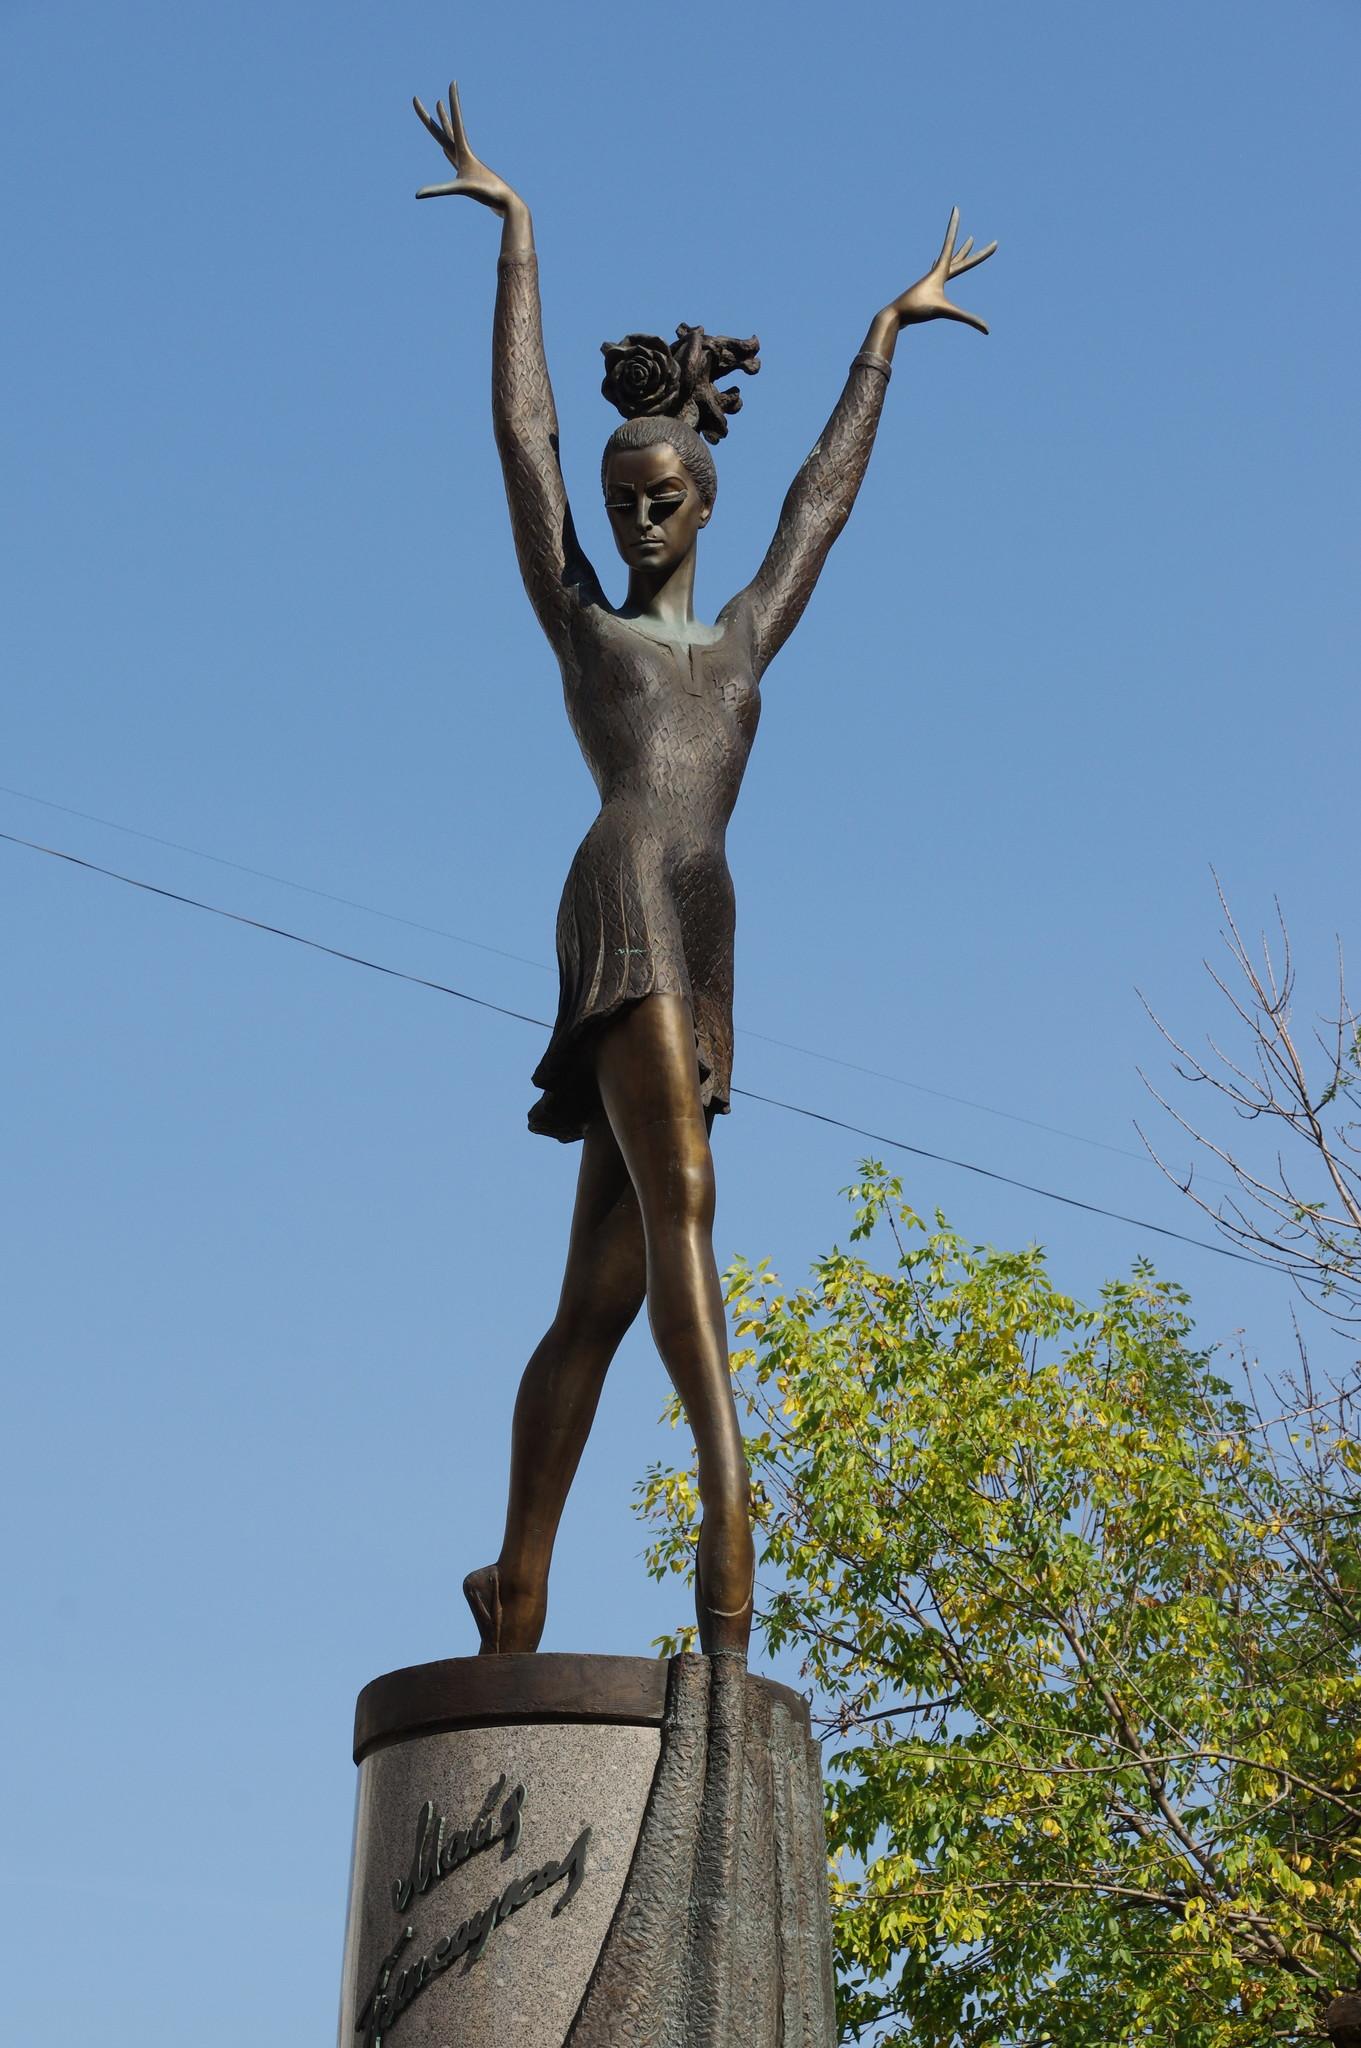 Памятник Майе Плисецкой в образе Кармен